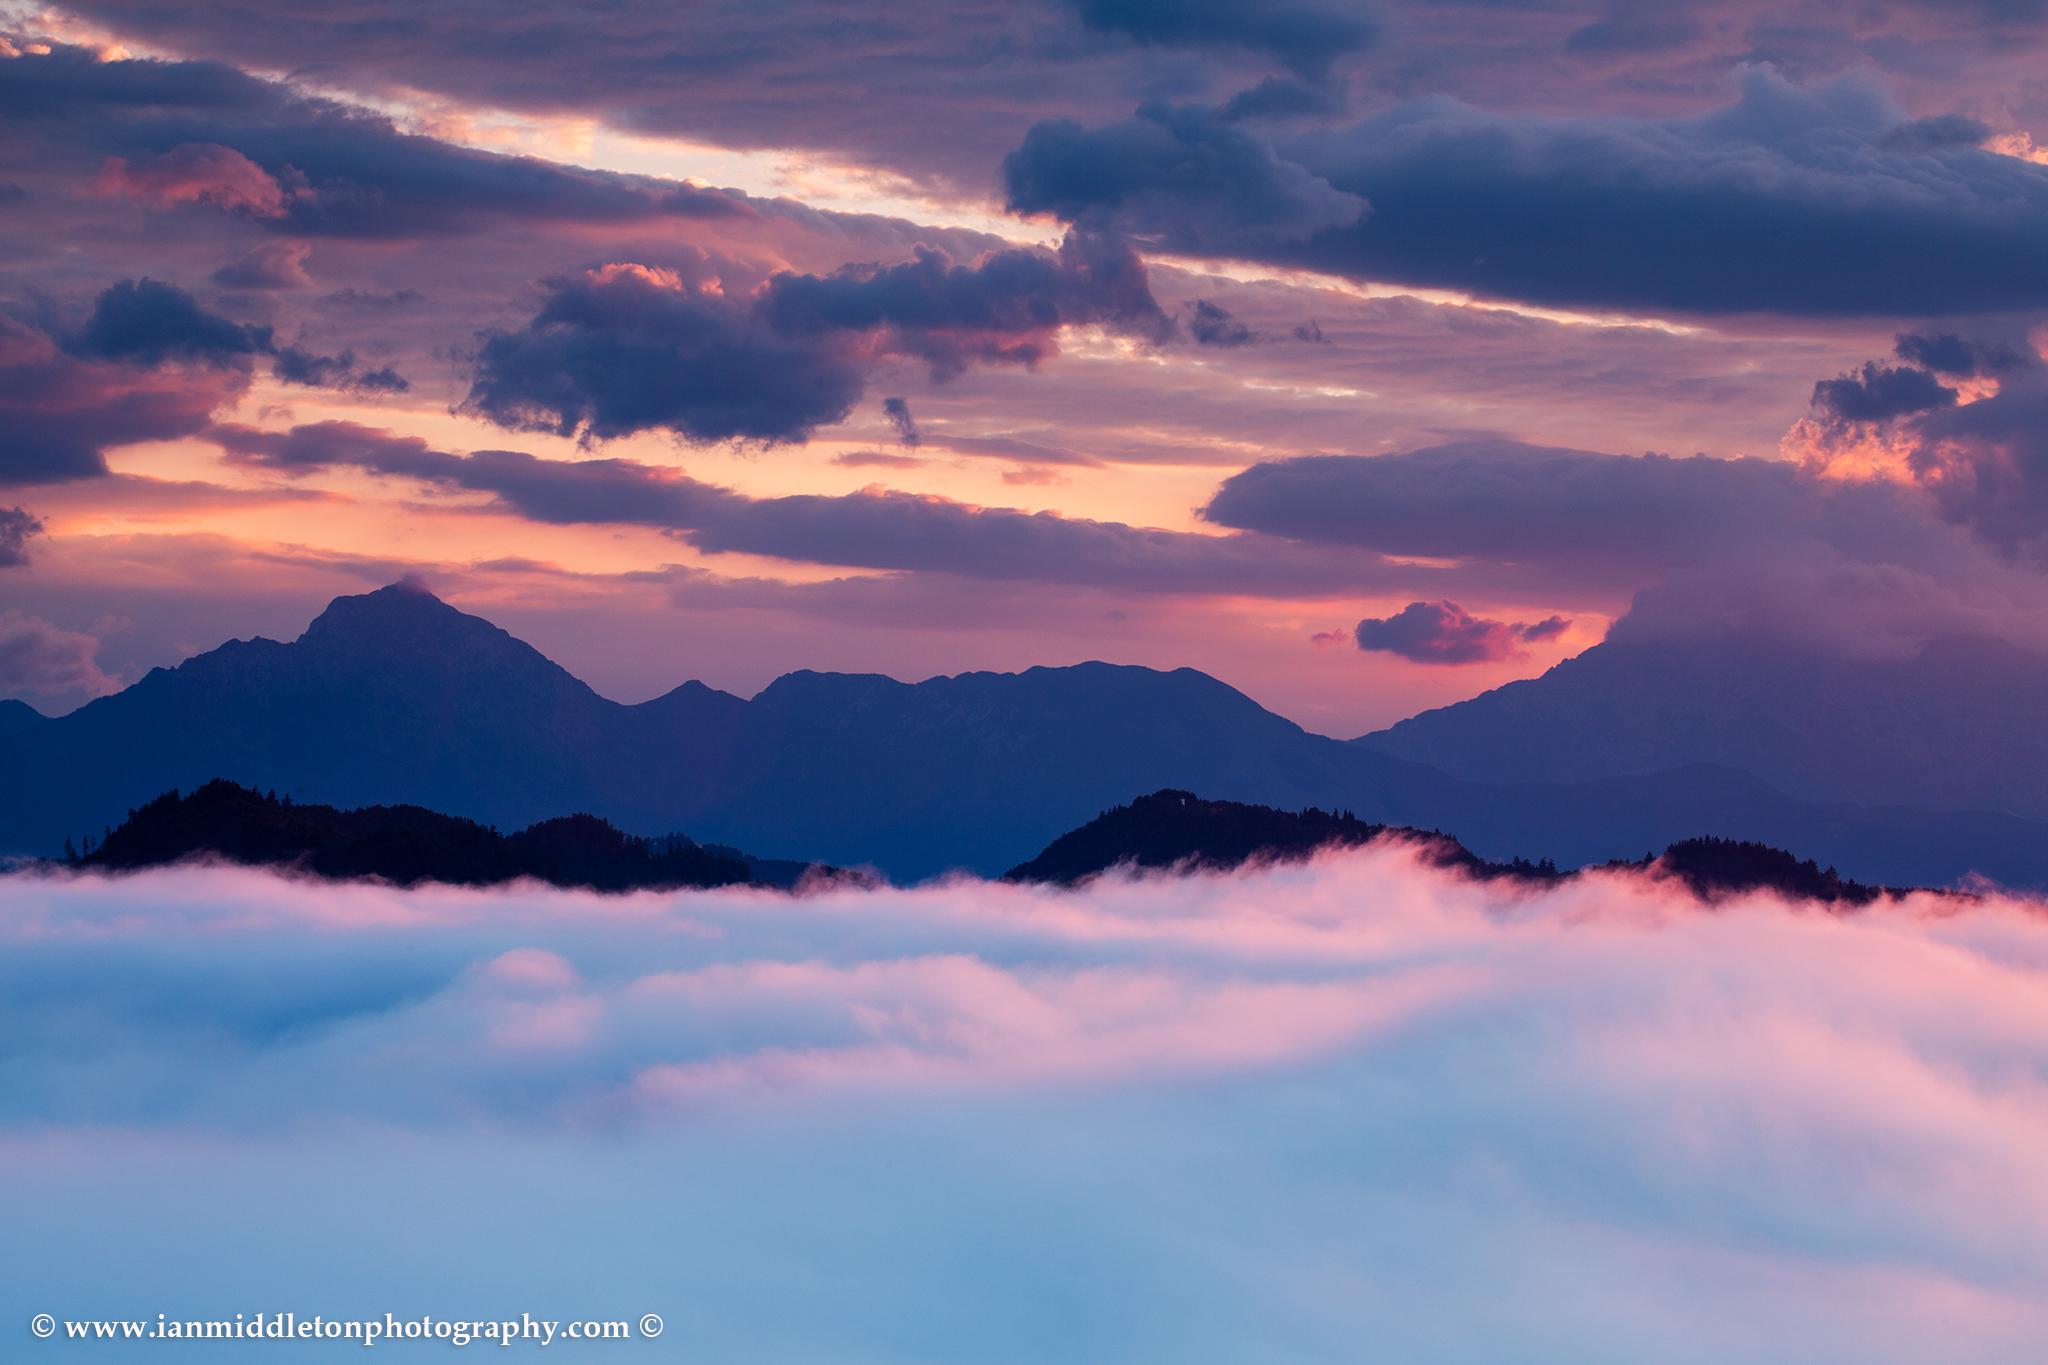 View across to Mount Storzic at sunrise from Rantovše hill near Skofja Loka, Slovenia.